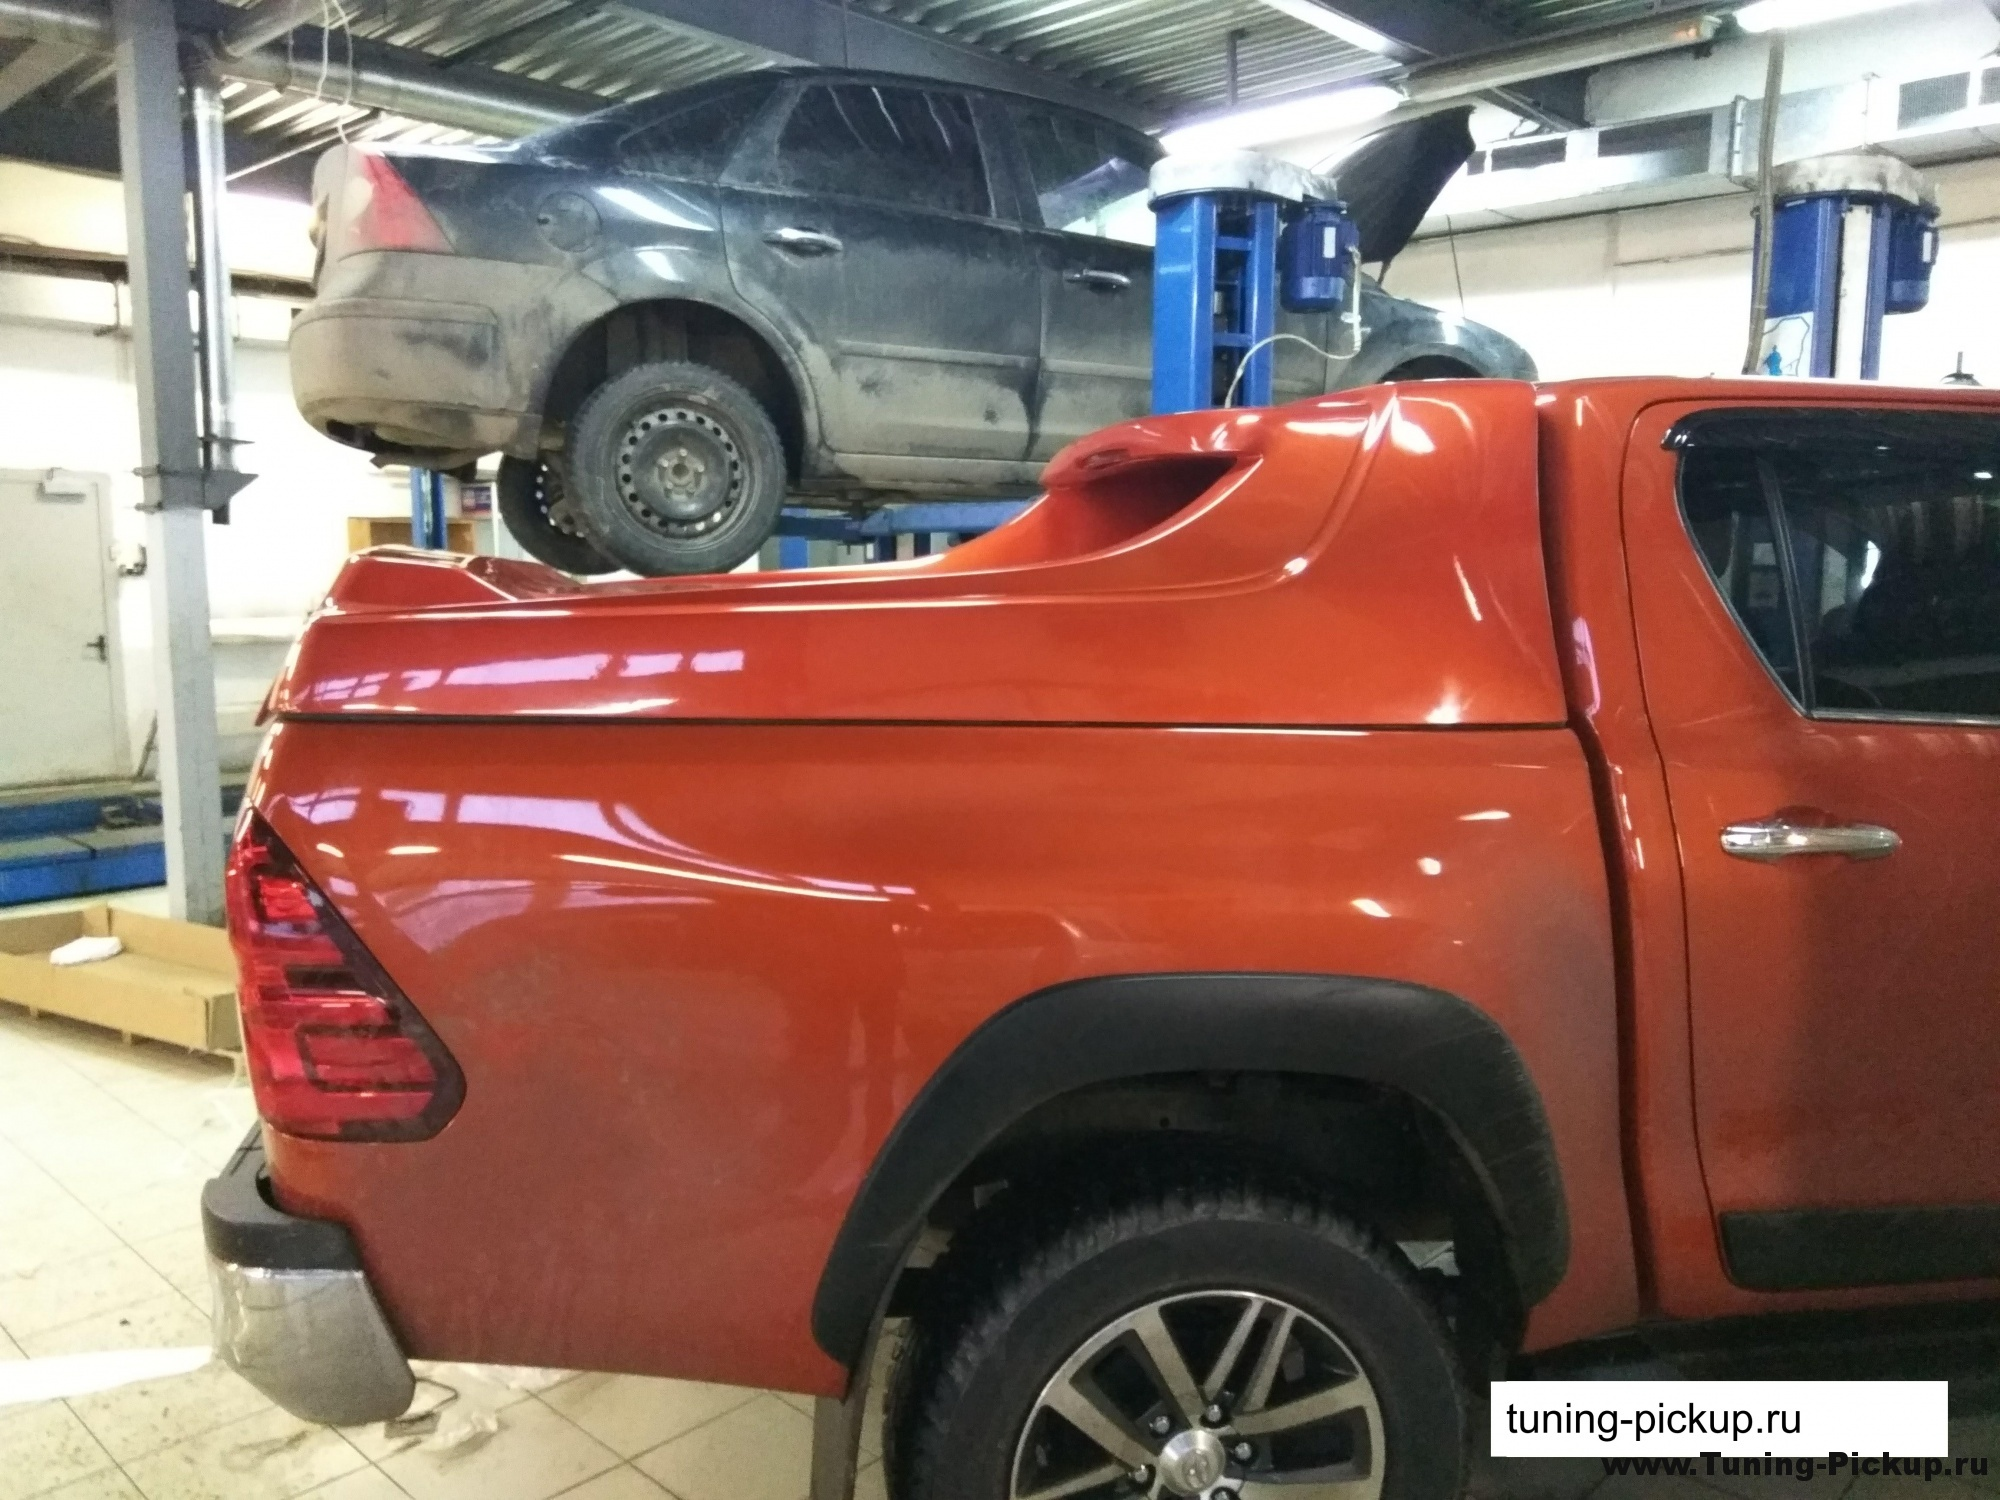 Grandbox Vip для Toyota Hilux 2015